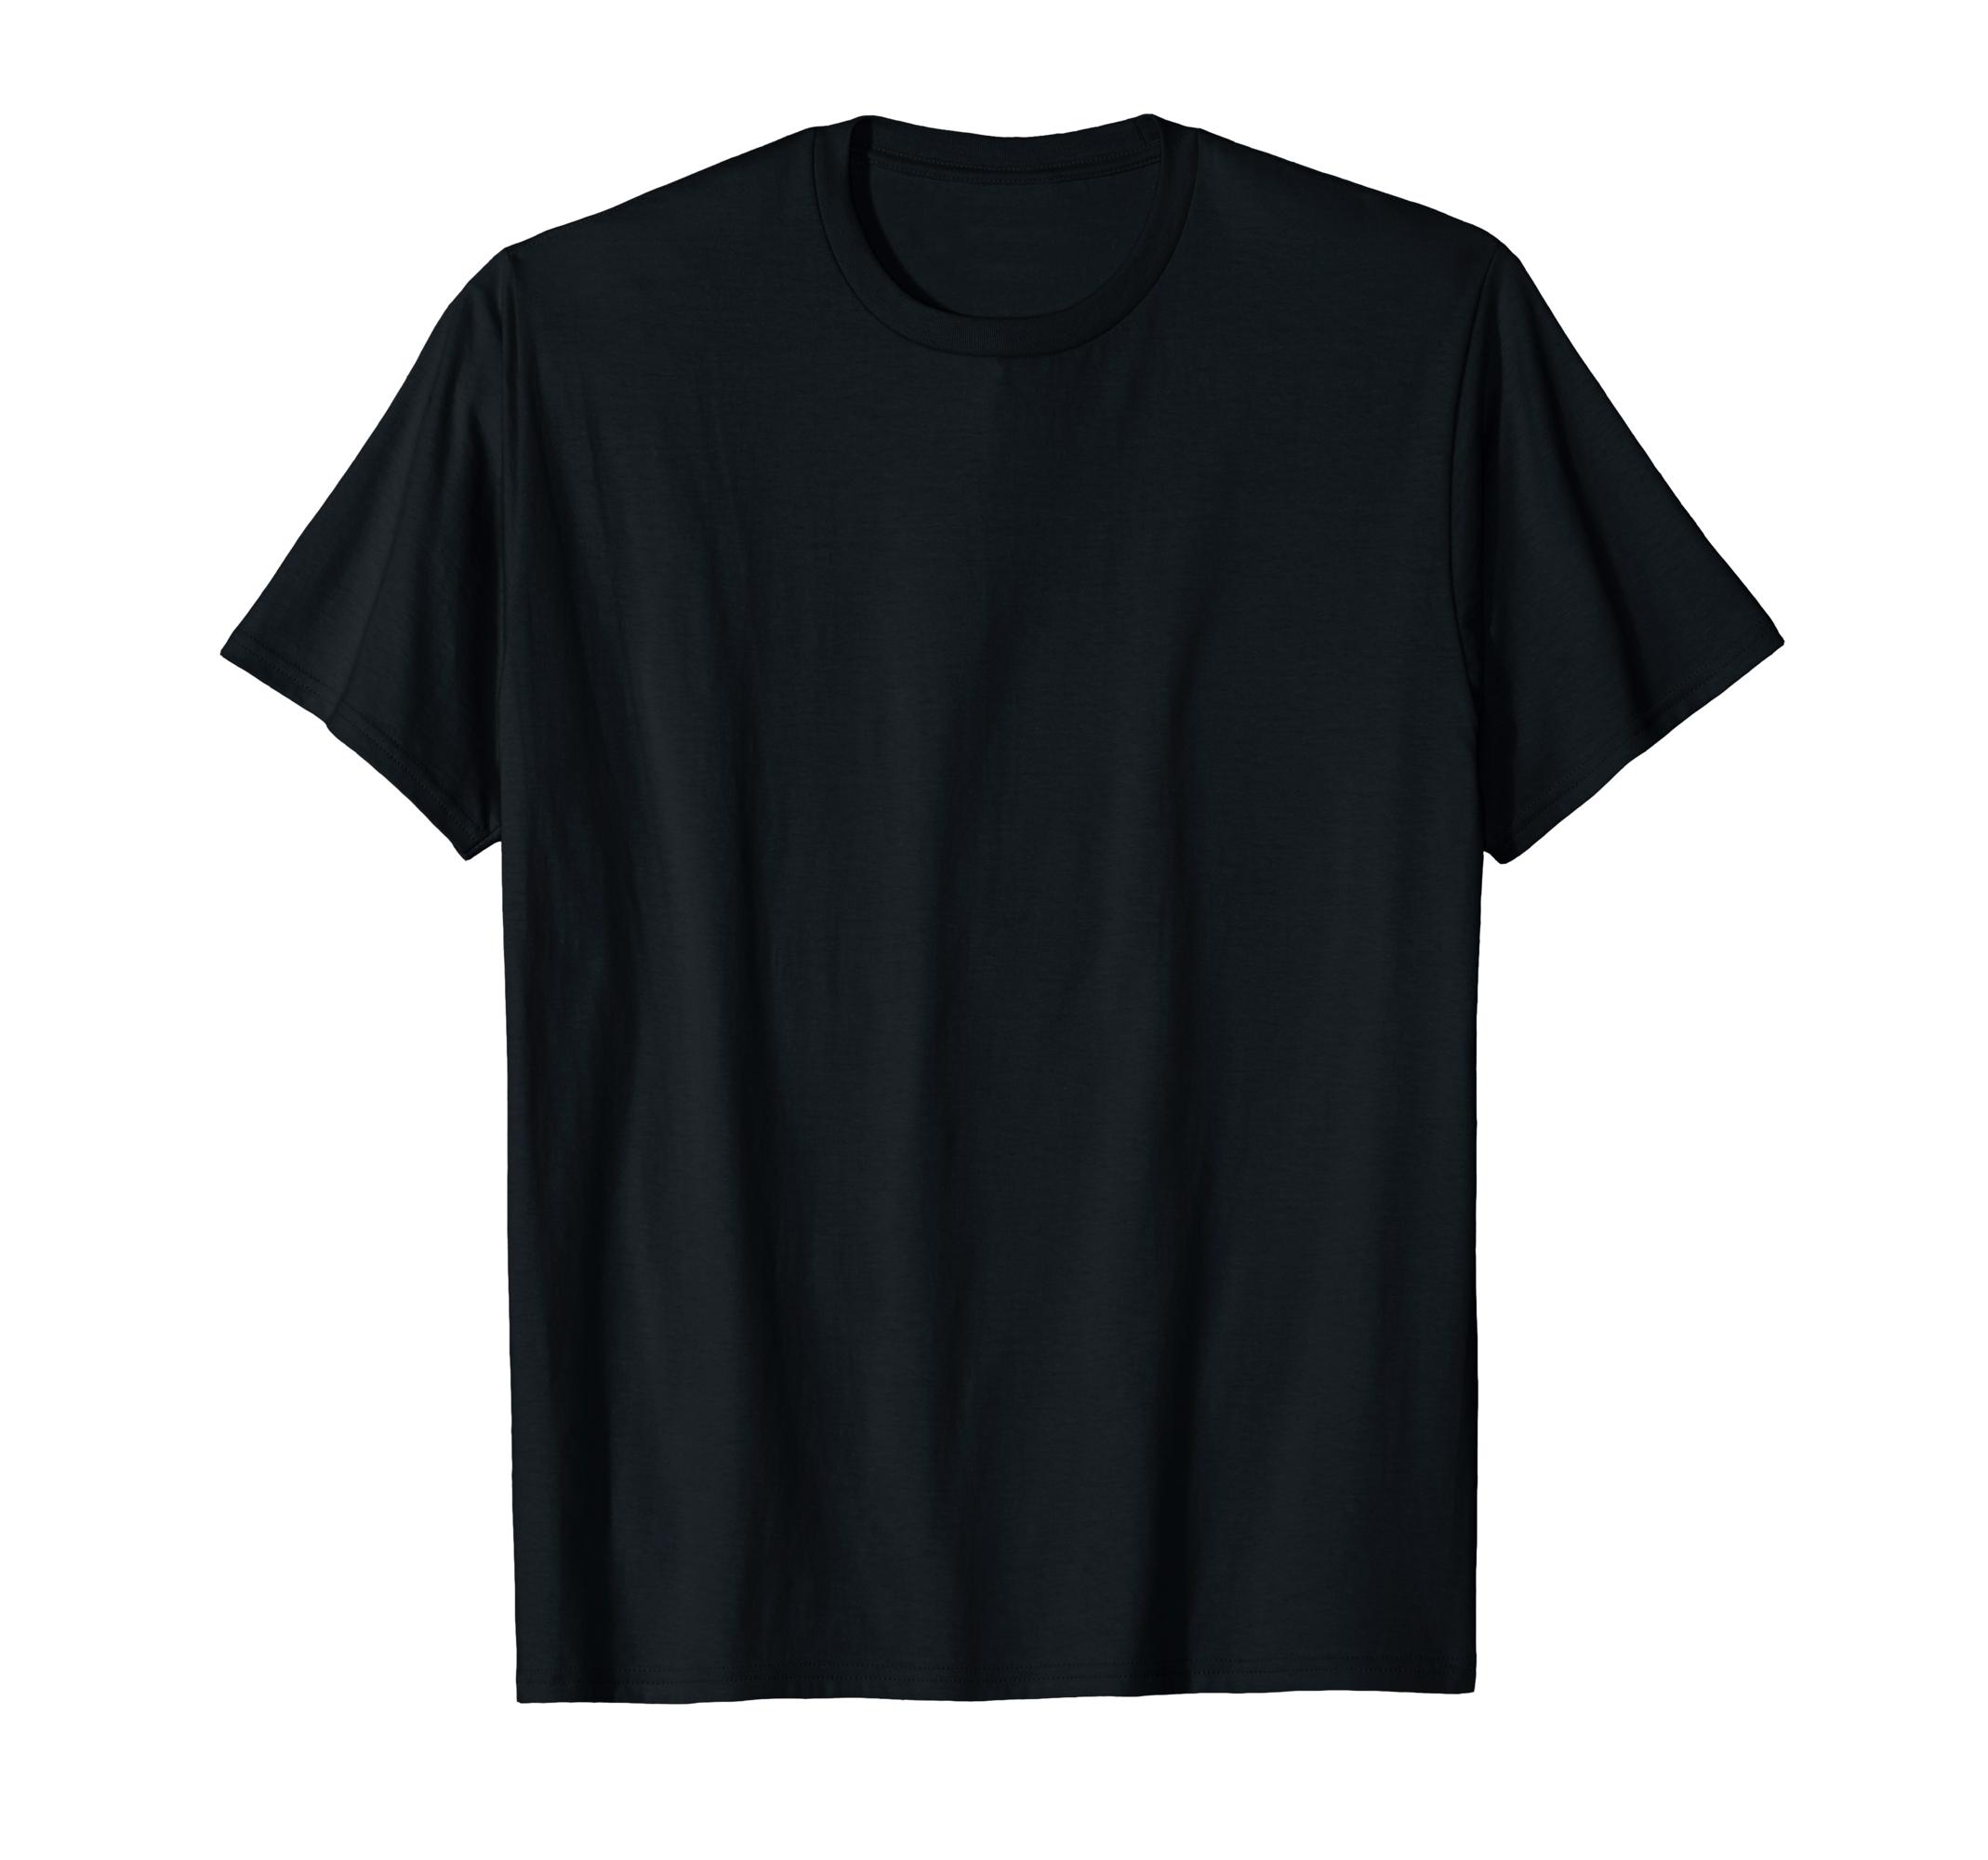 Hug Me Funny New Novelty Funny Men/'s Regular Fit Cotton T-Shirt